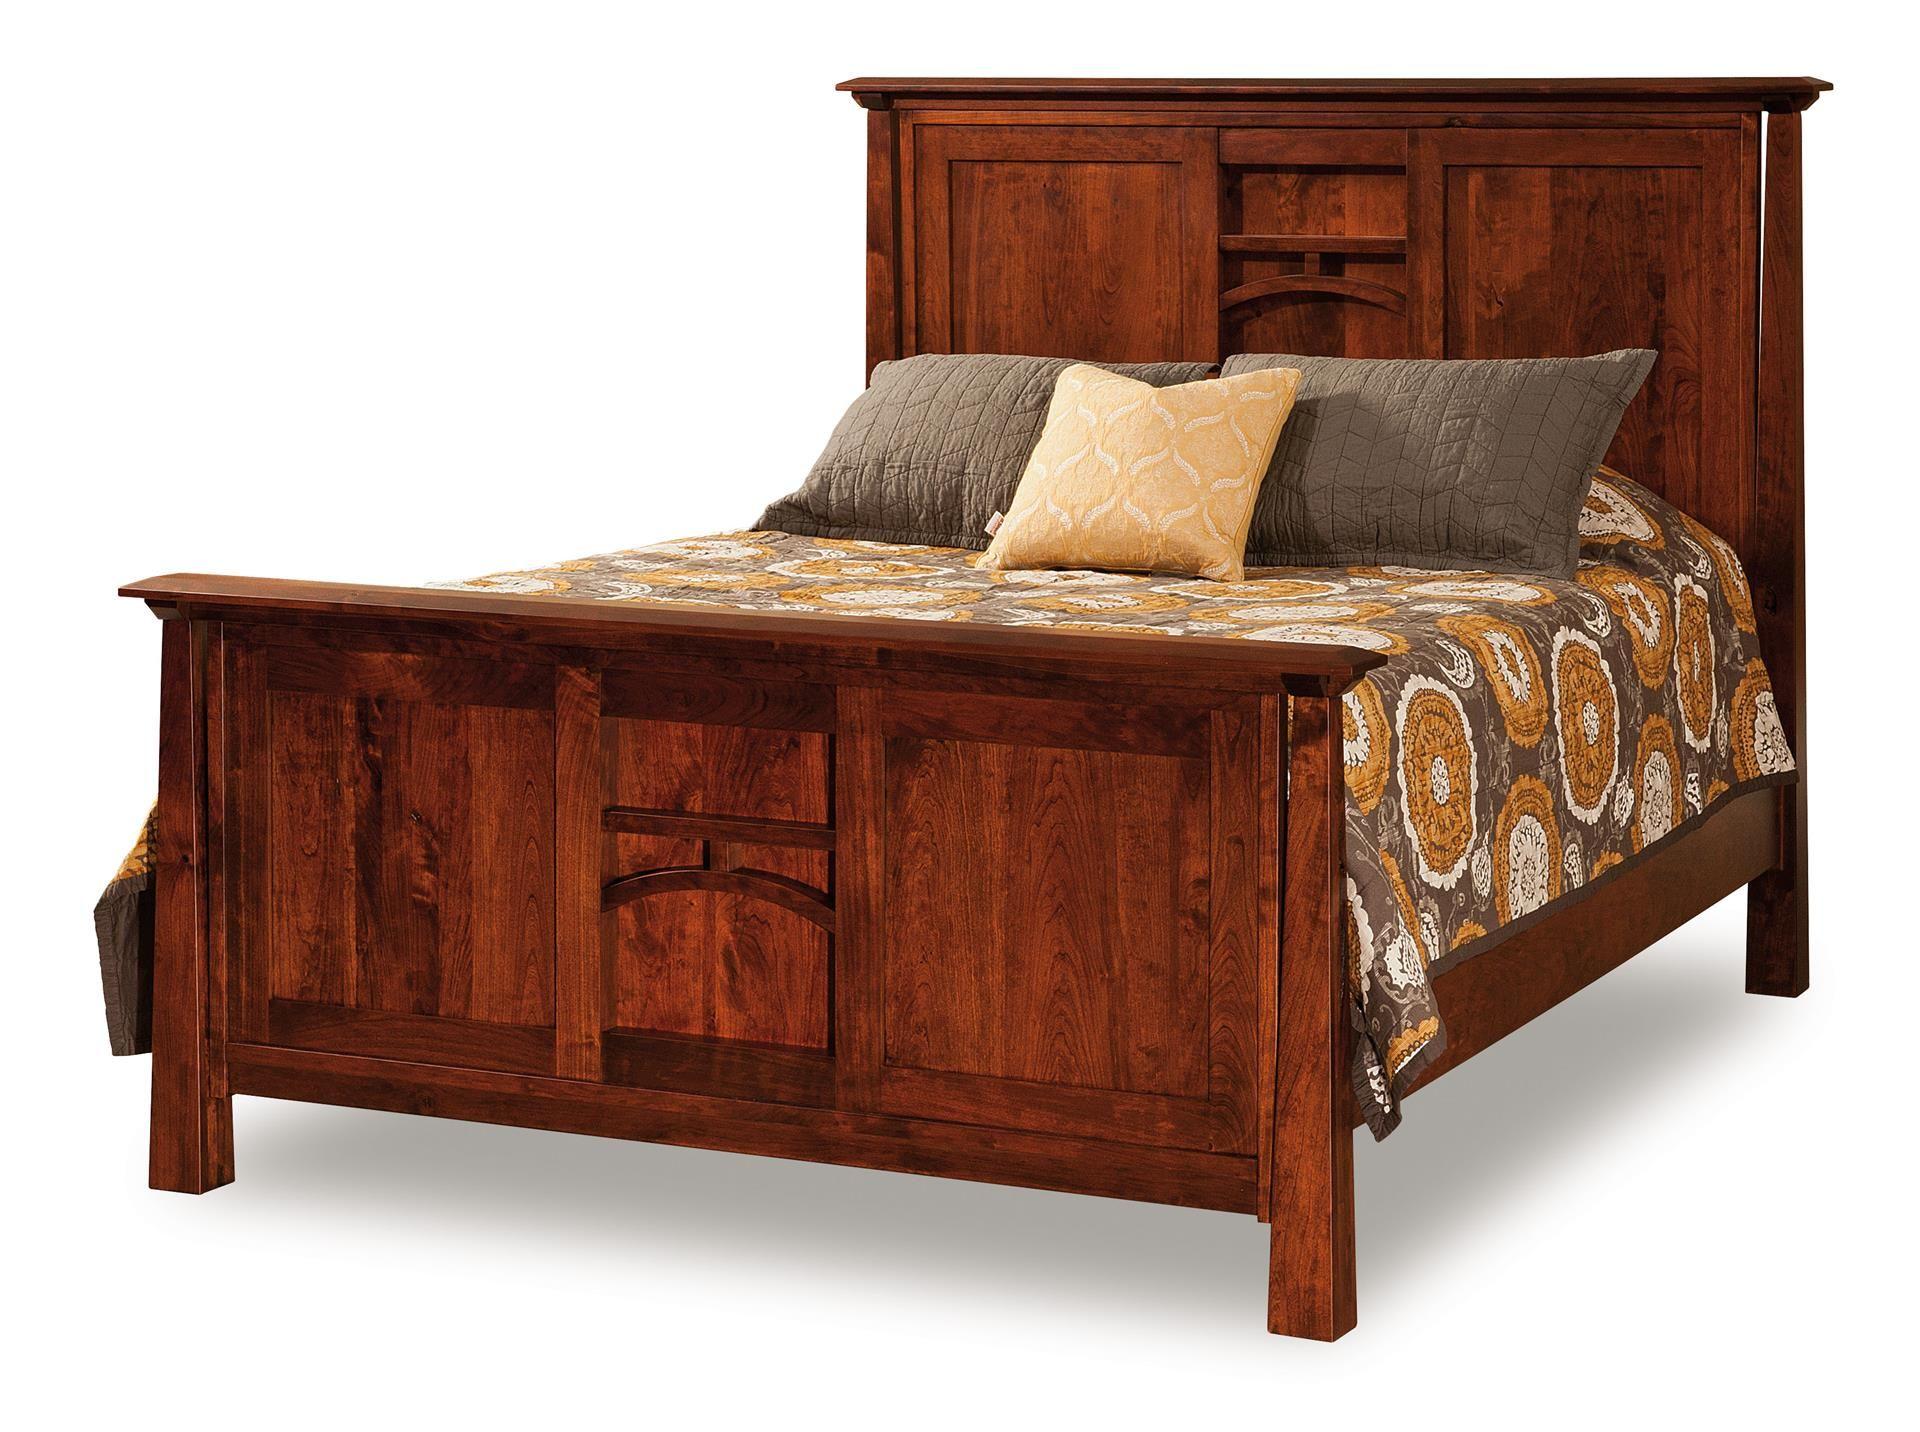 Amish Artesa Bed